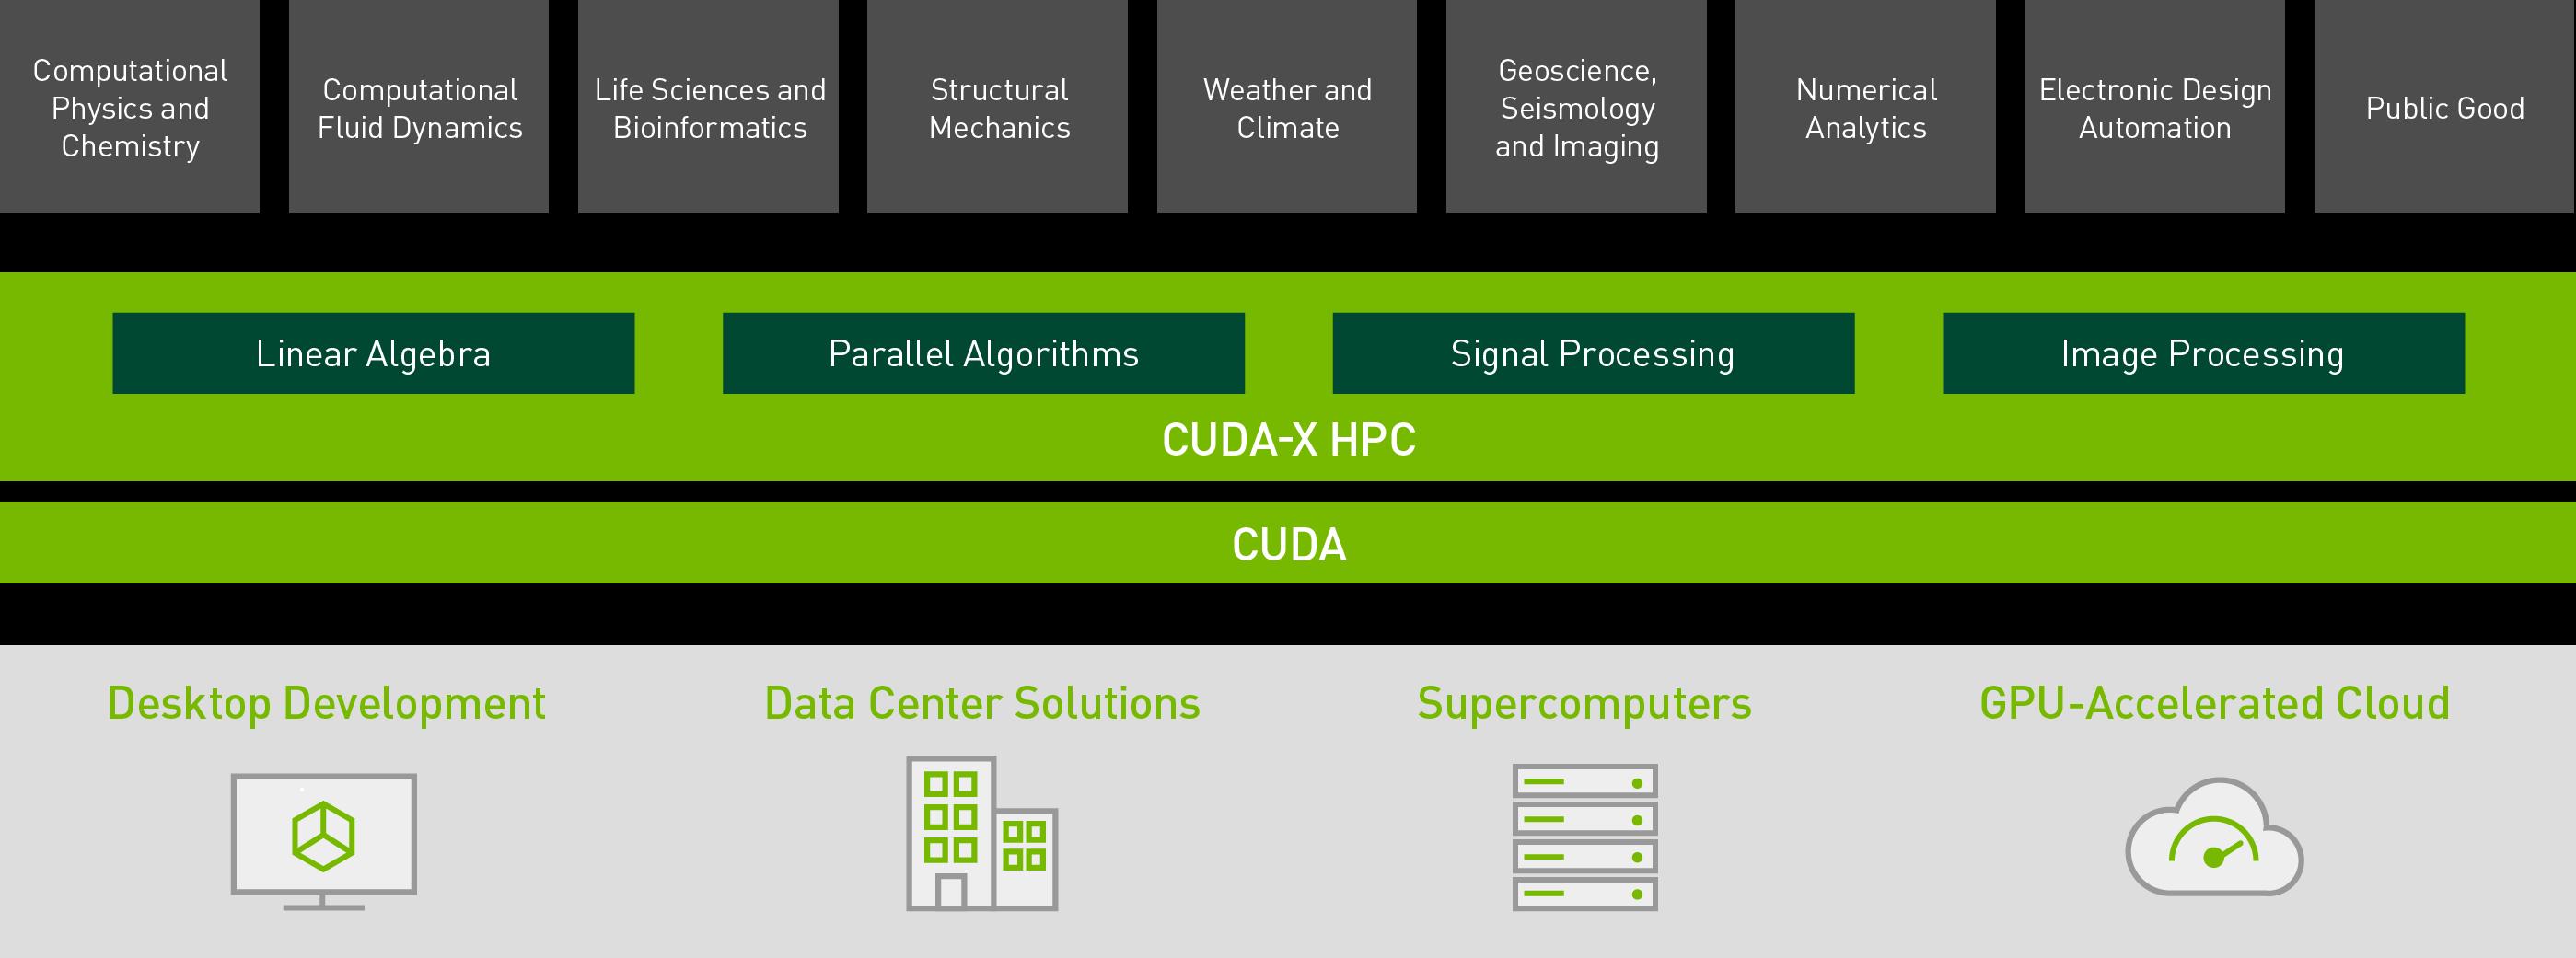 cuda x hpc ecosystem diagram